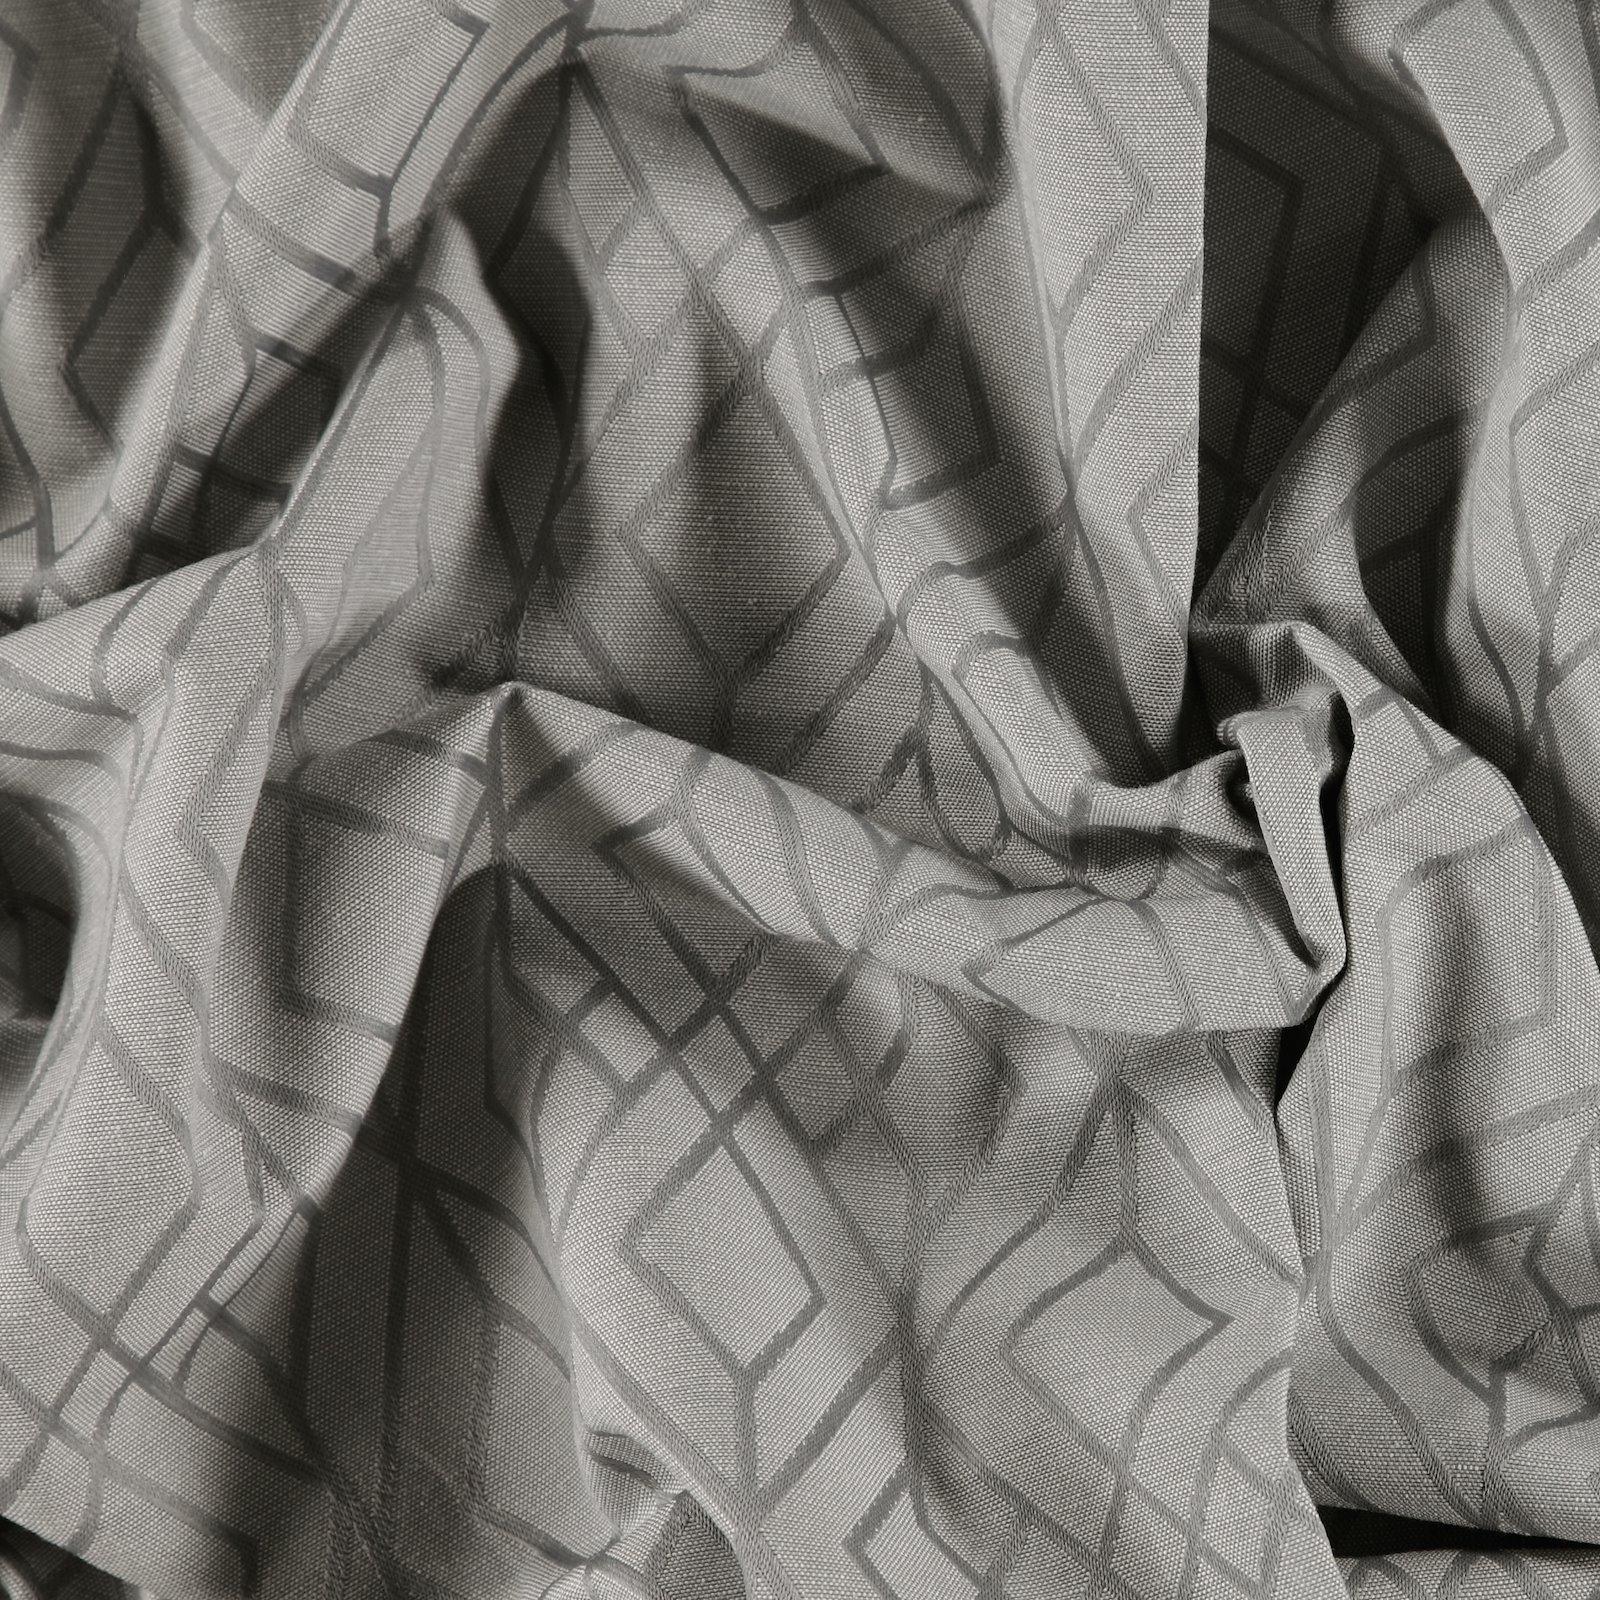 Yarn dyed grey with pattern